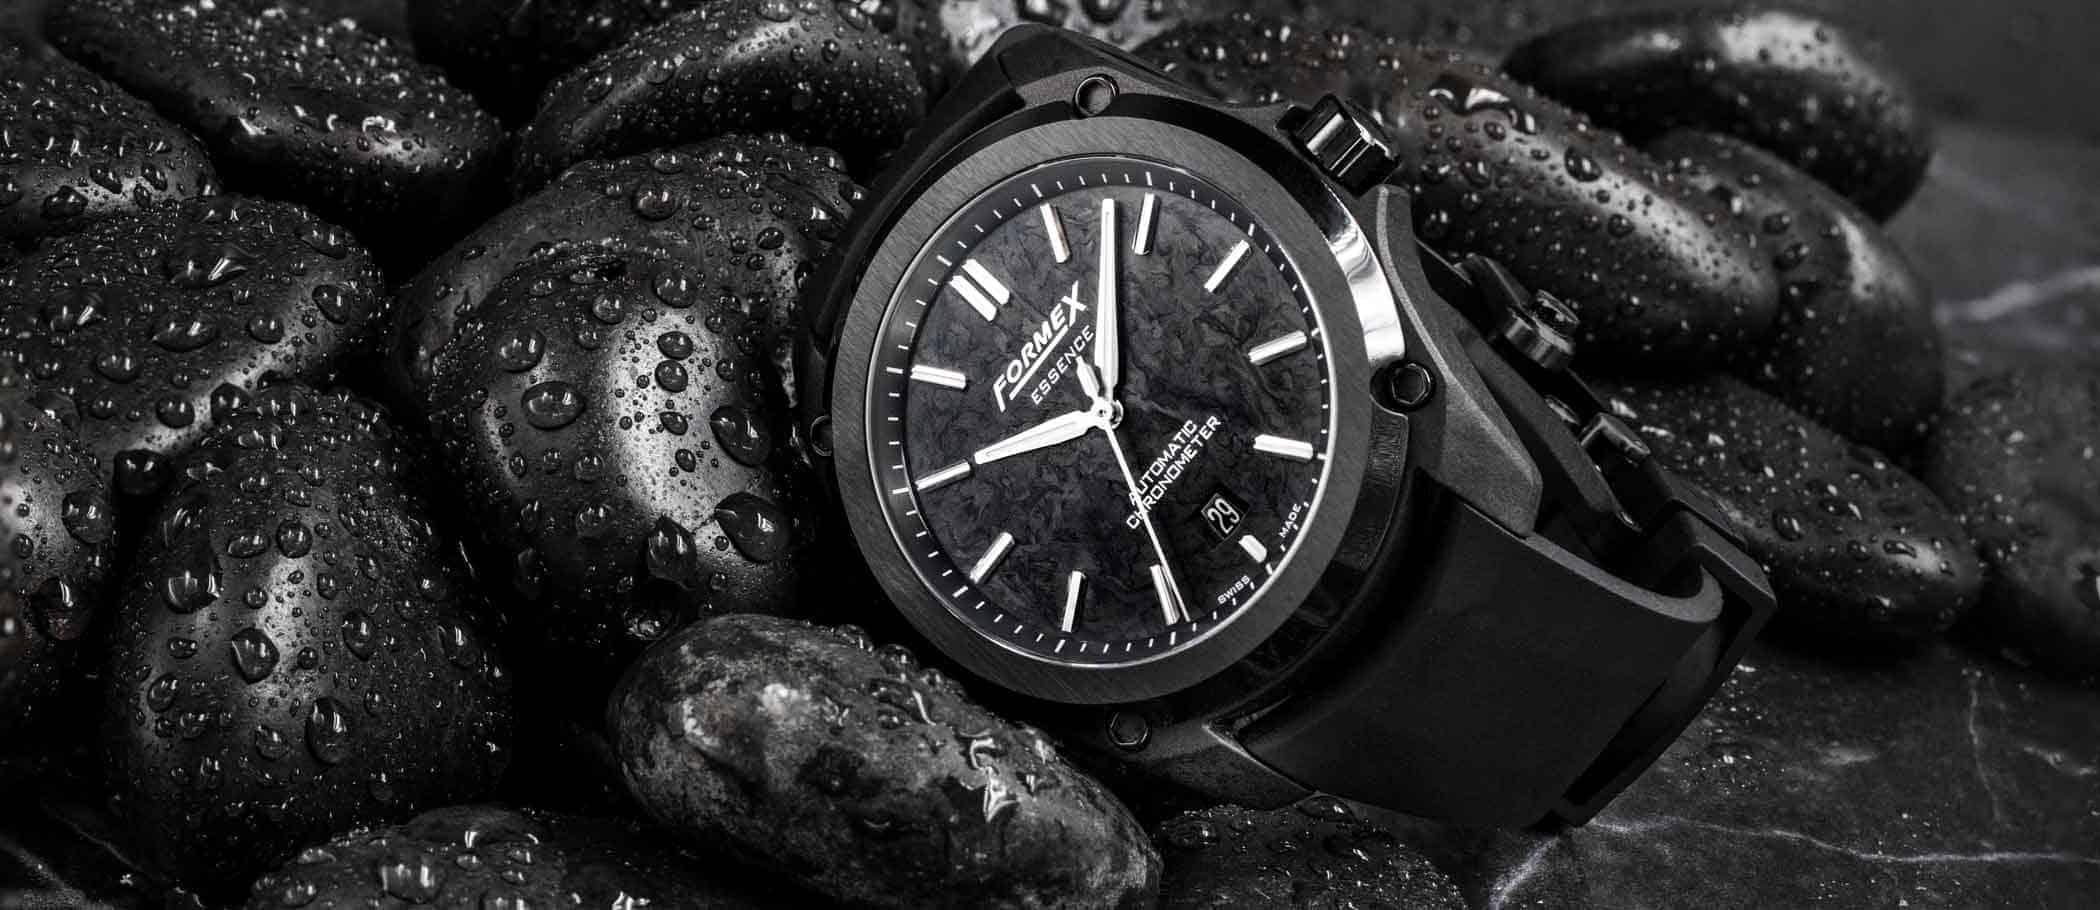 Formex-Essence-LEGGERA-Automatic-Chronometer-FORGED-CARBON-Styled-1